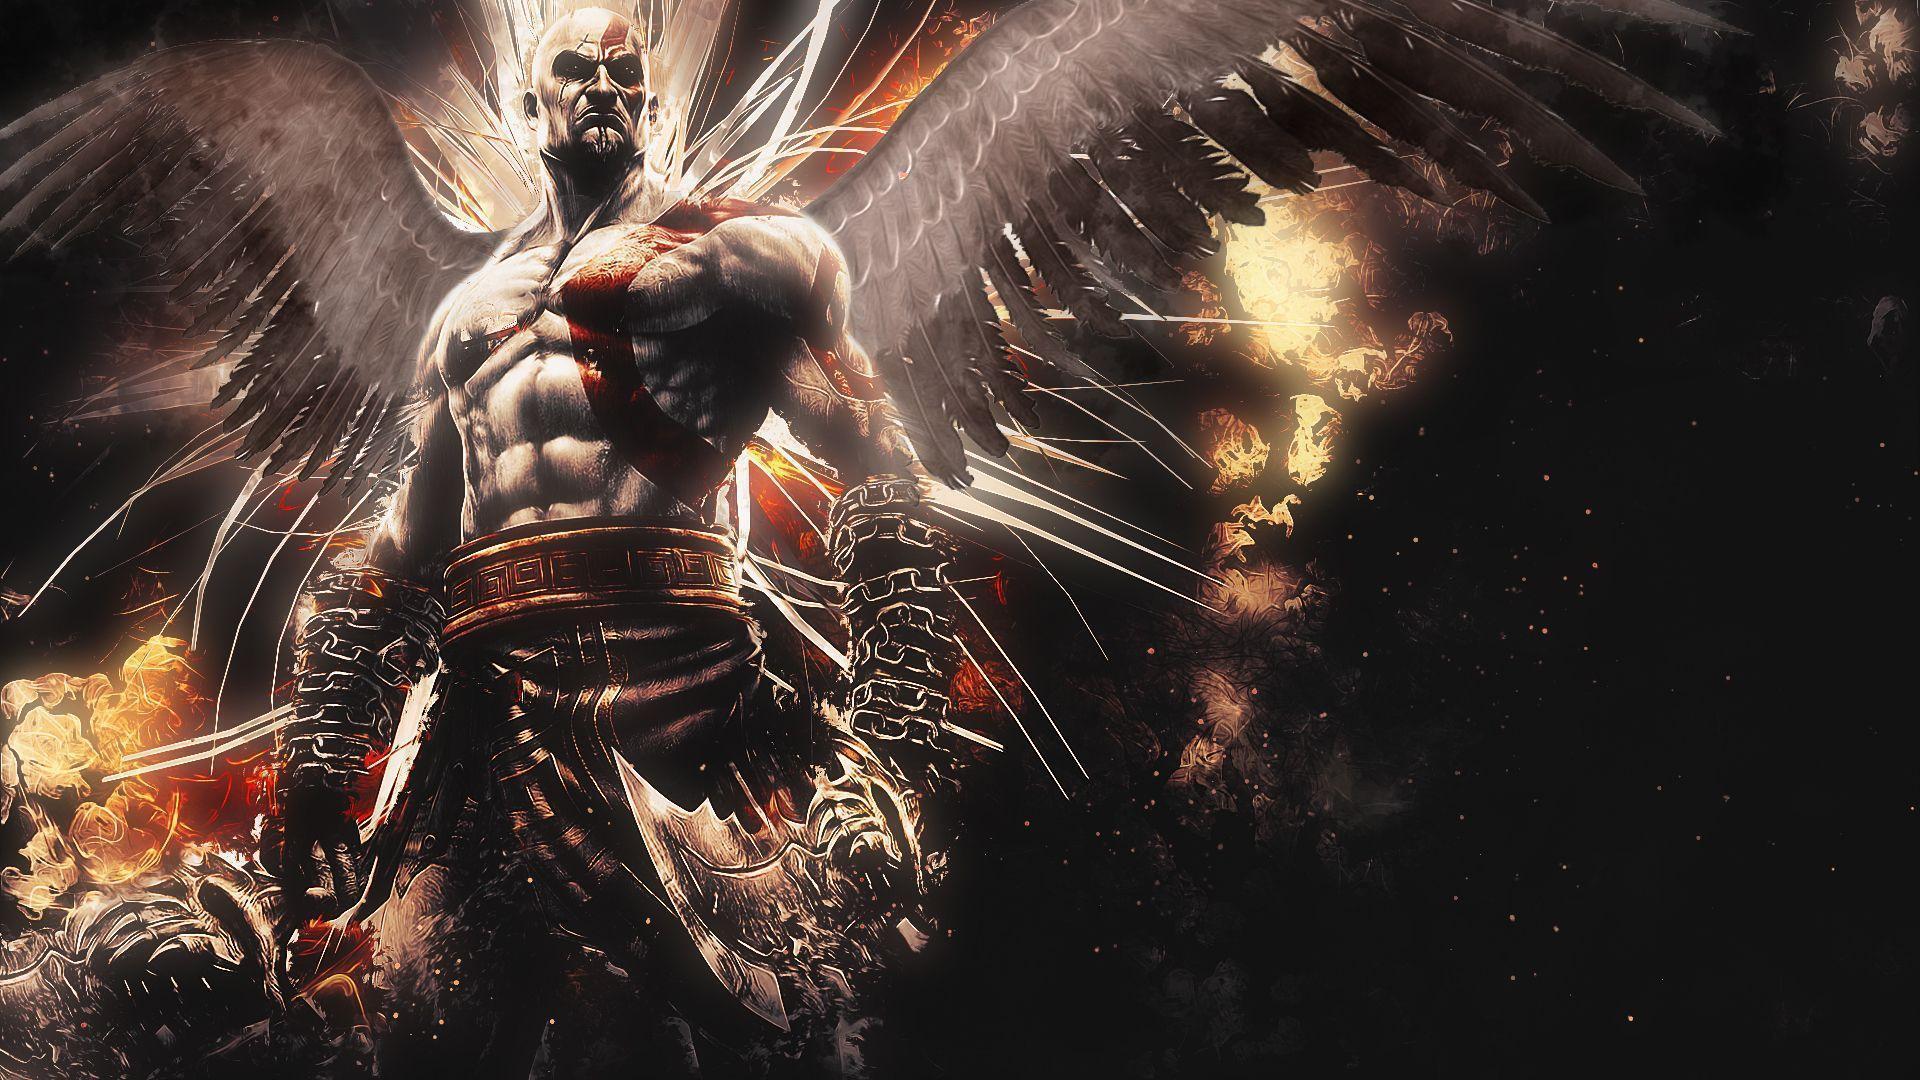 Full HD 1080p God of war Wallpapers HD, Desktop Backgrounds ...